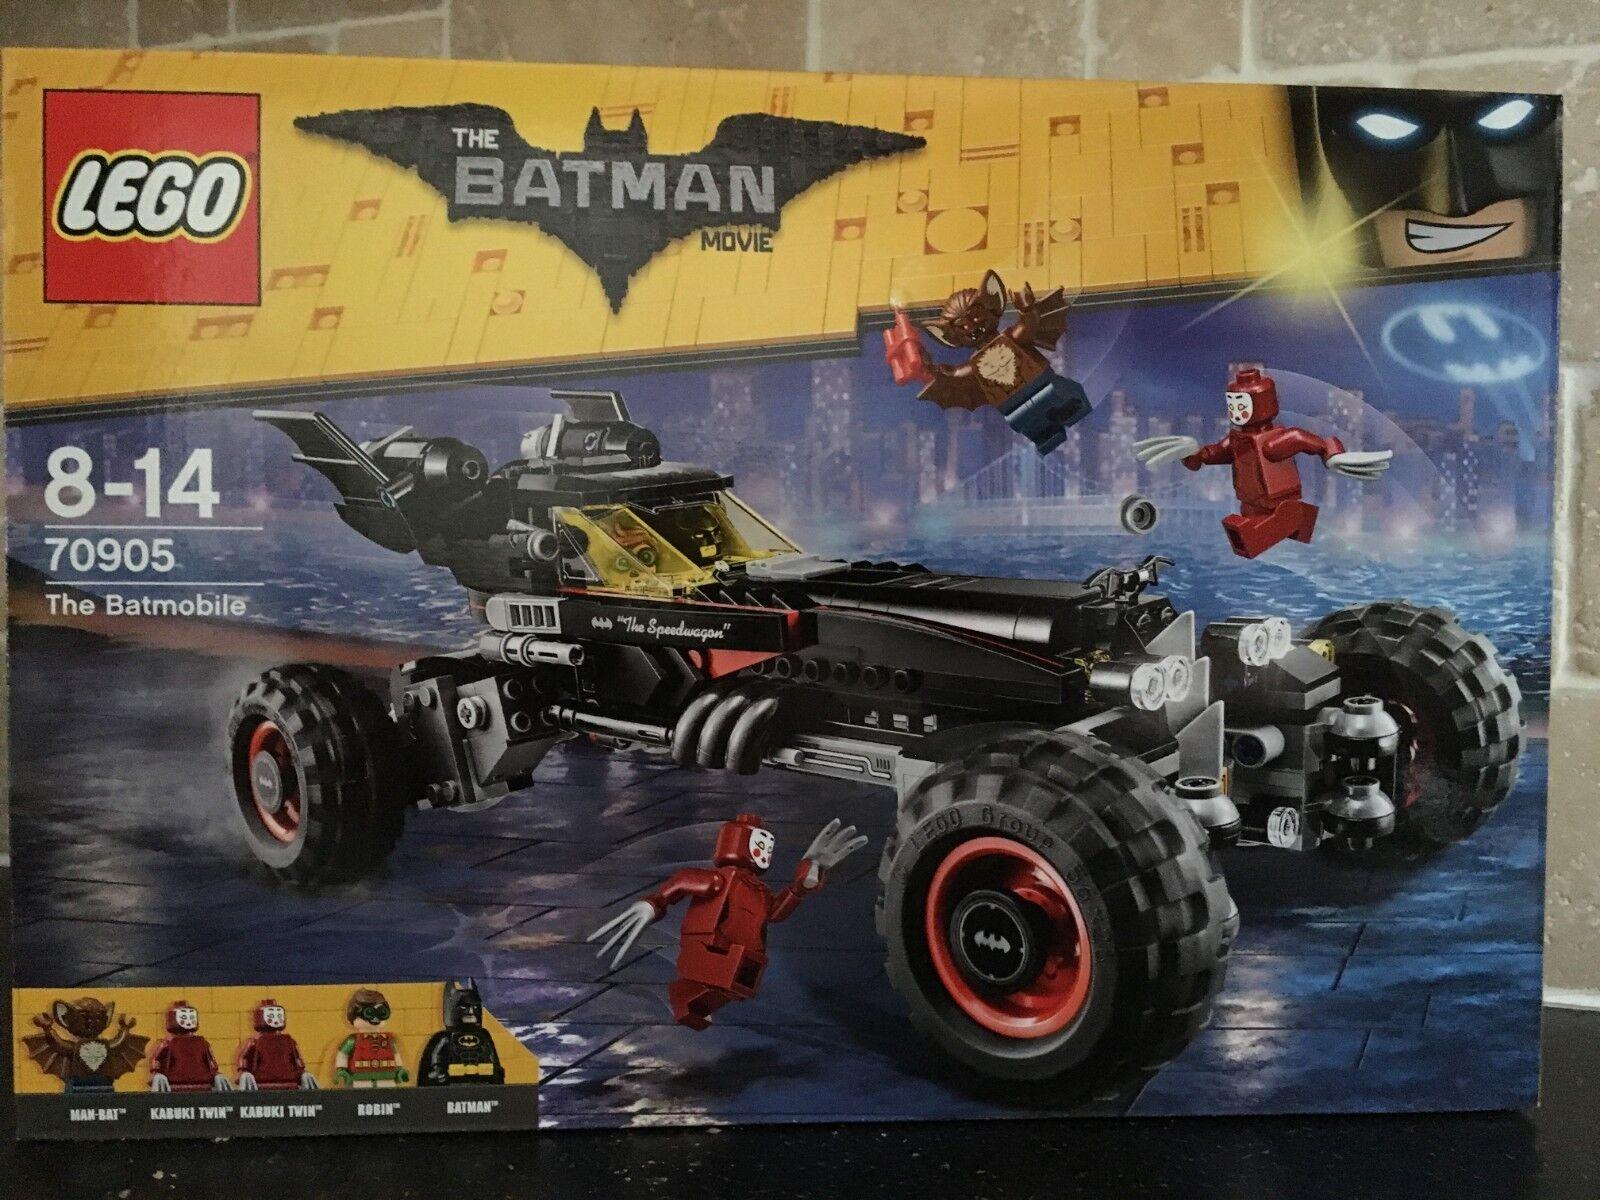 LEGO THE BATMAN MOVIE - 70905 The Batmobile Brand New In Sealed Box